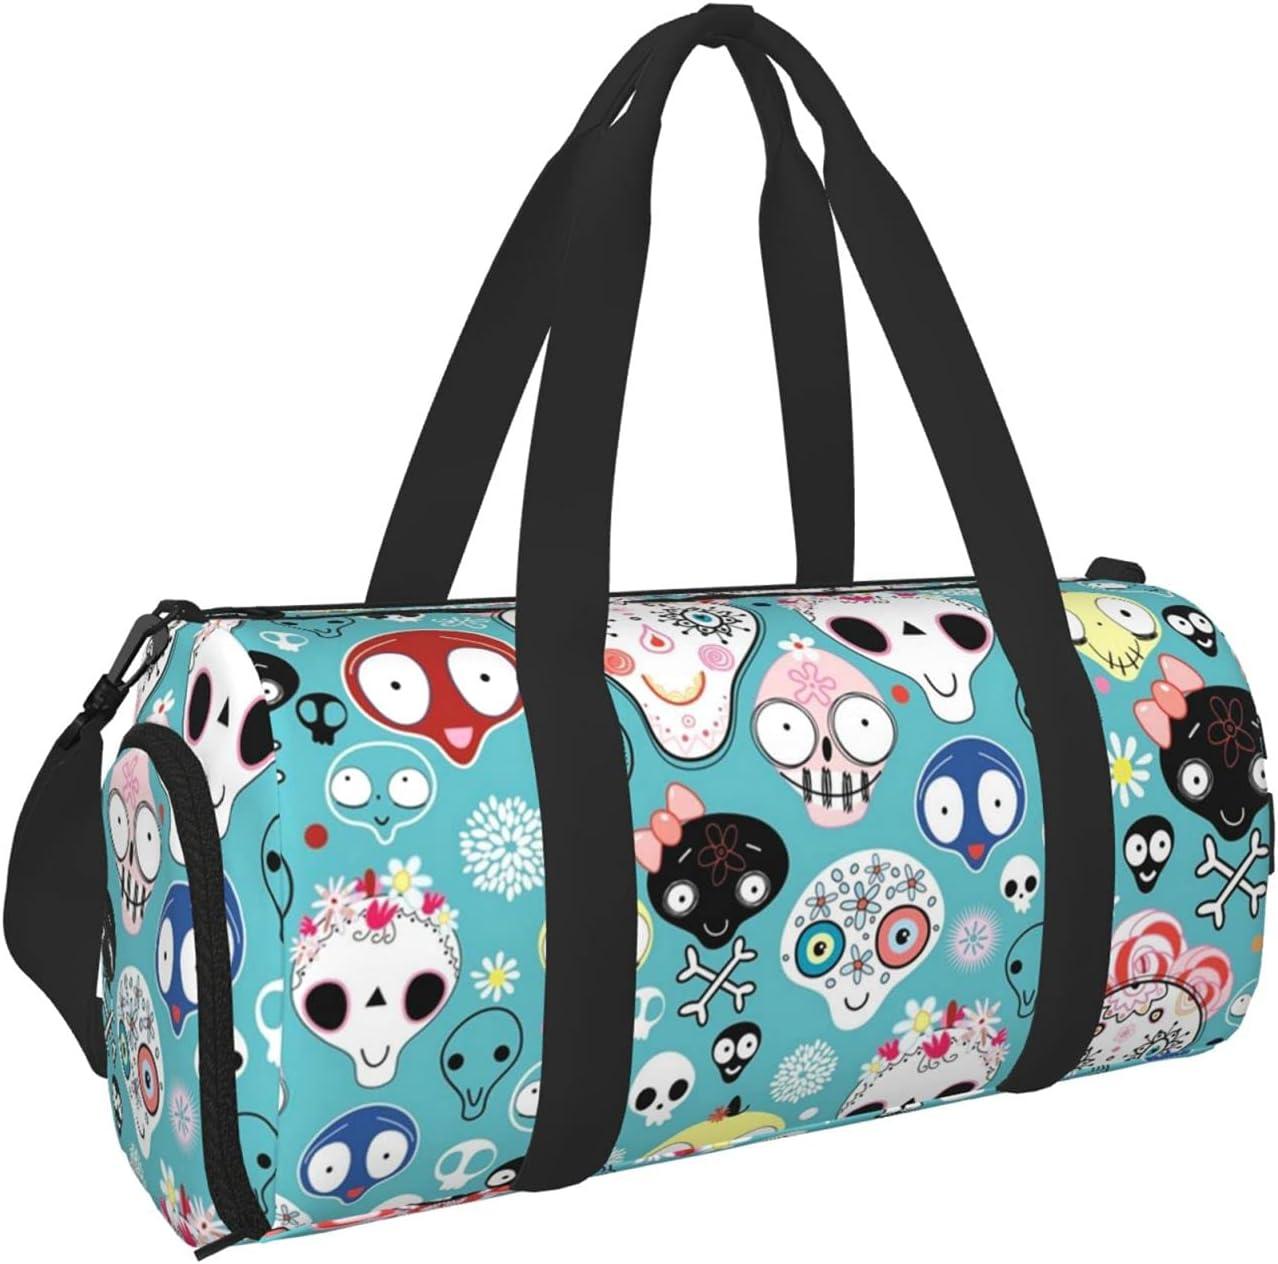 Cute girl Gym Bag for Men and w Duffel Travel New arrival Yoga Women Dedication bag